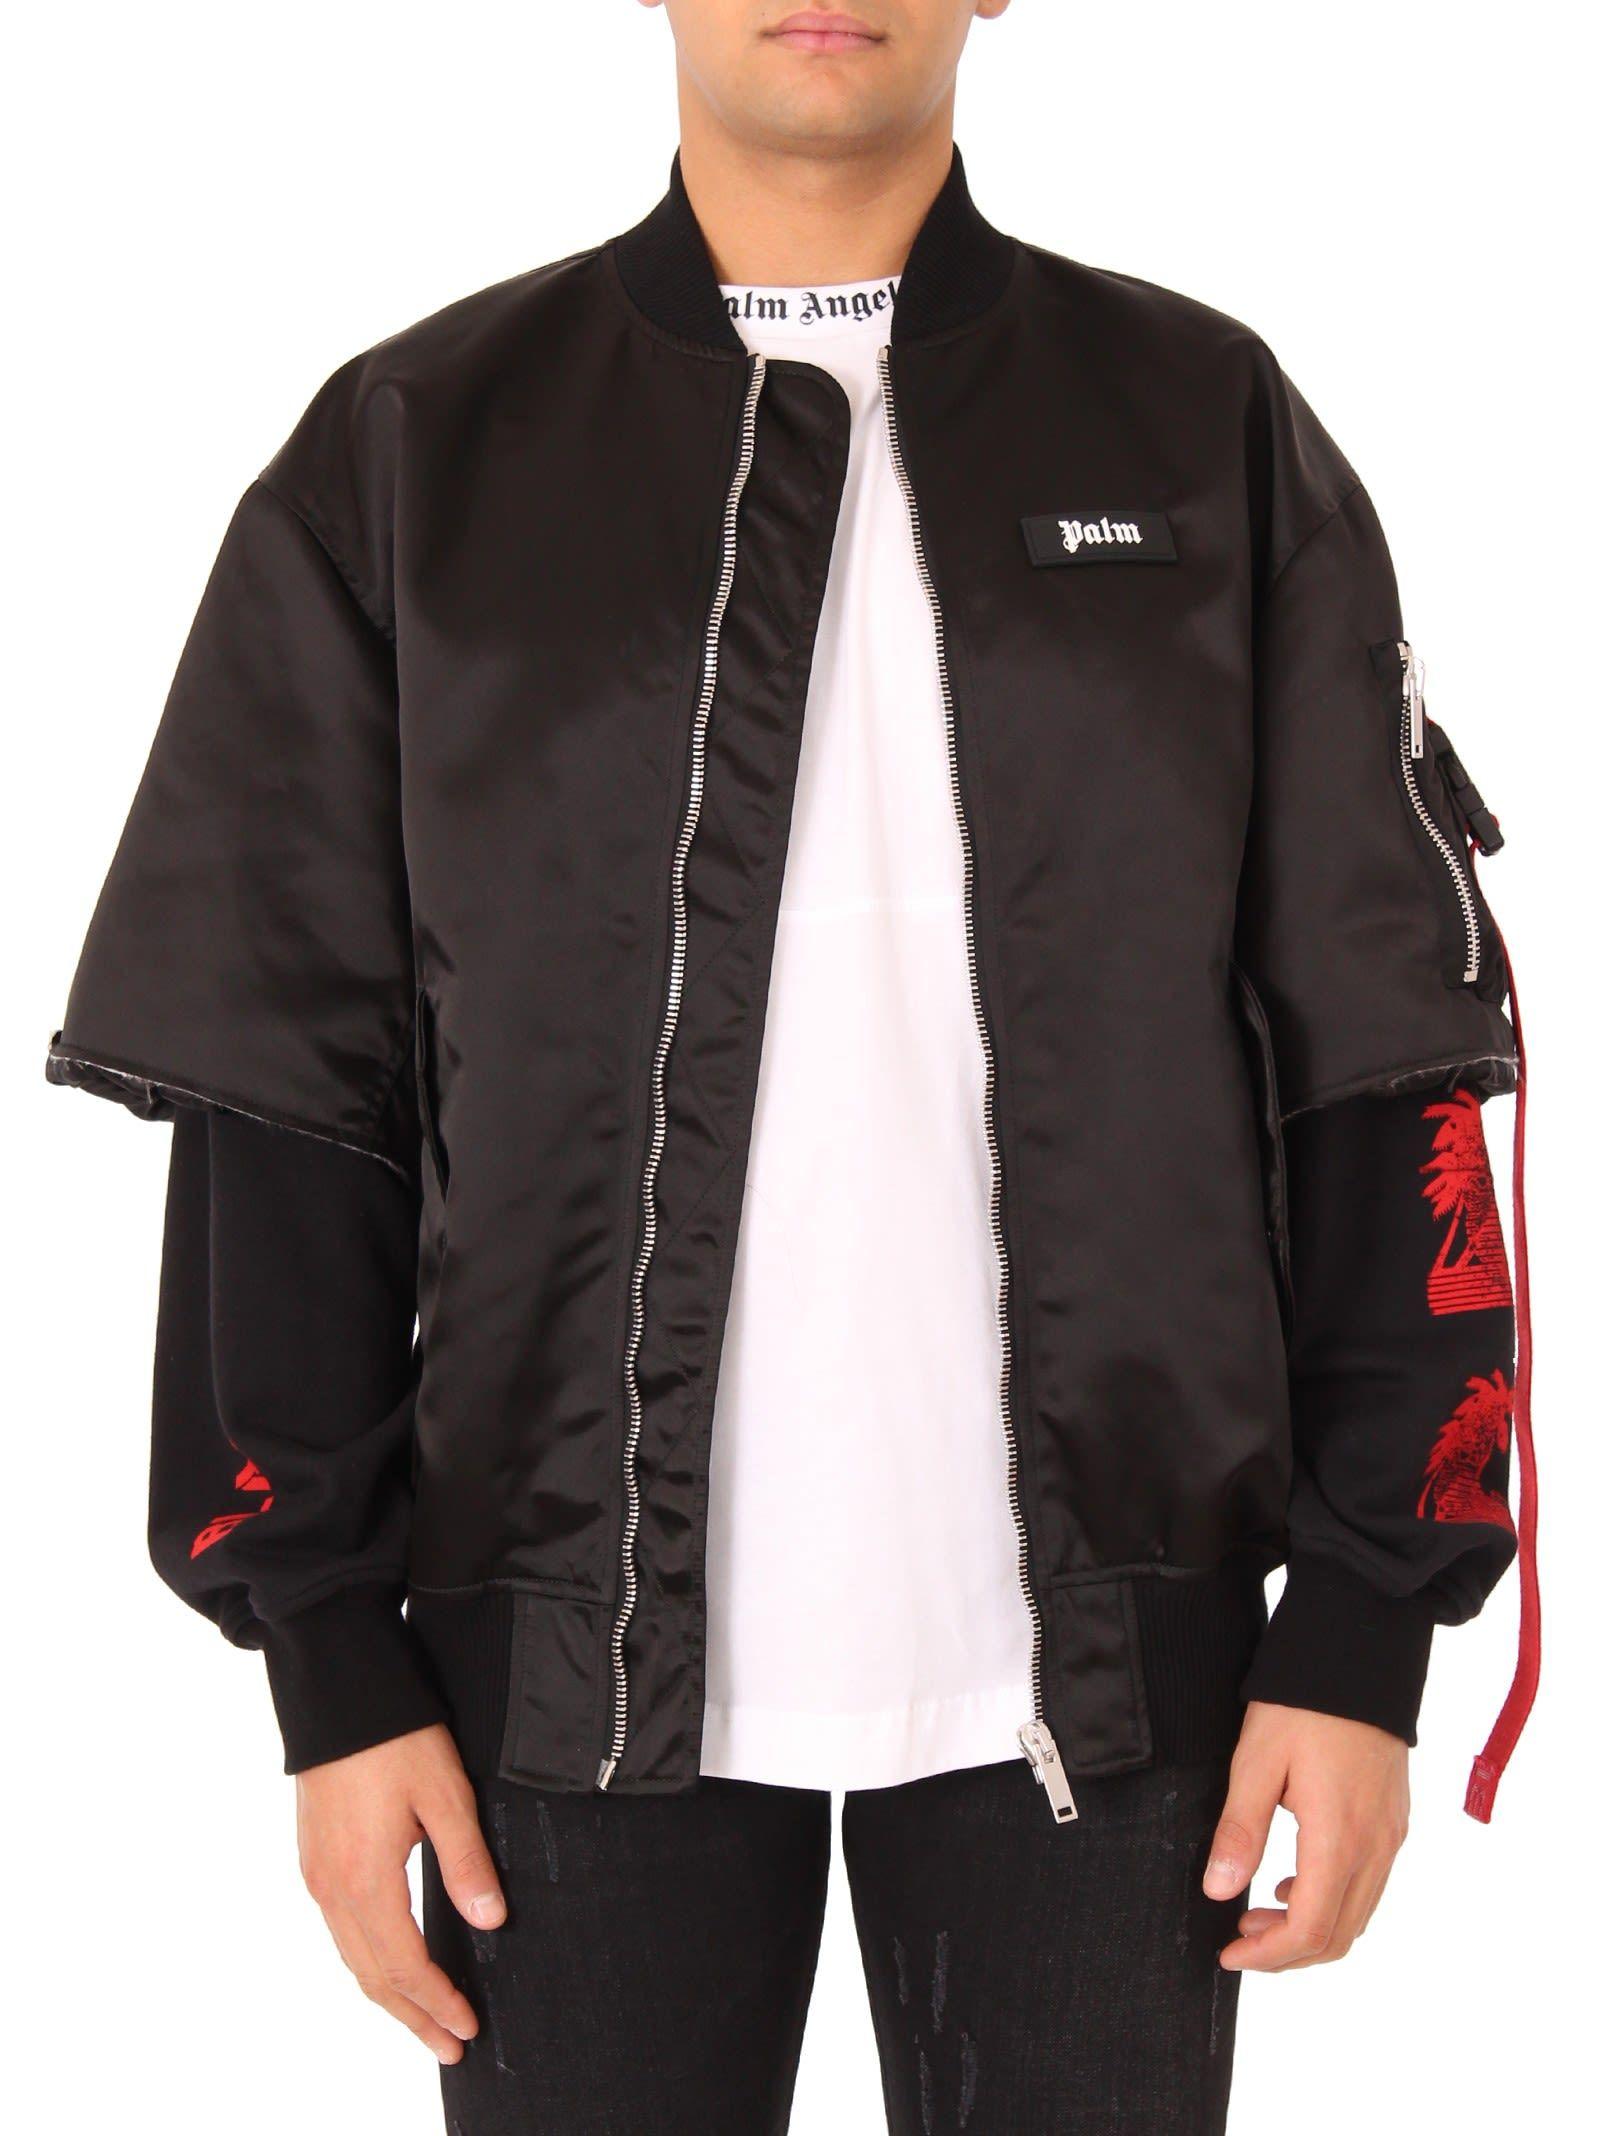 Palm Angels Black Prayer Bomber Jacket Palmangels Cloth Polyester Jacket Bomber Jacket Jackets [ 2136 x 1600 Pixel ]